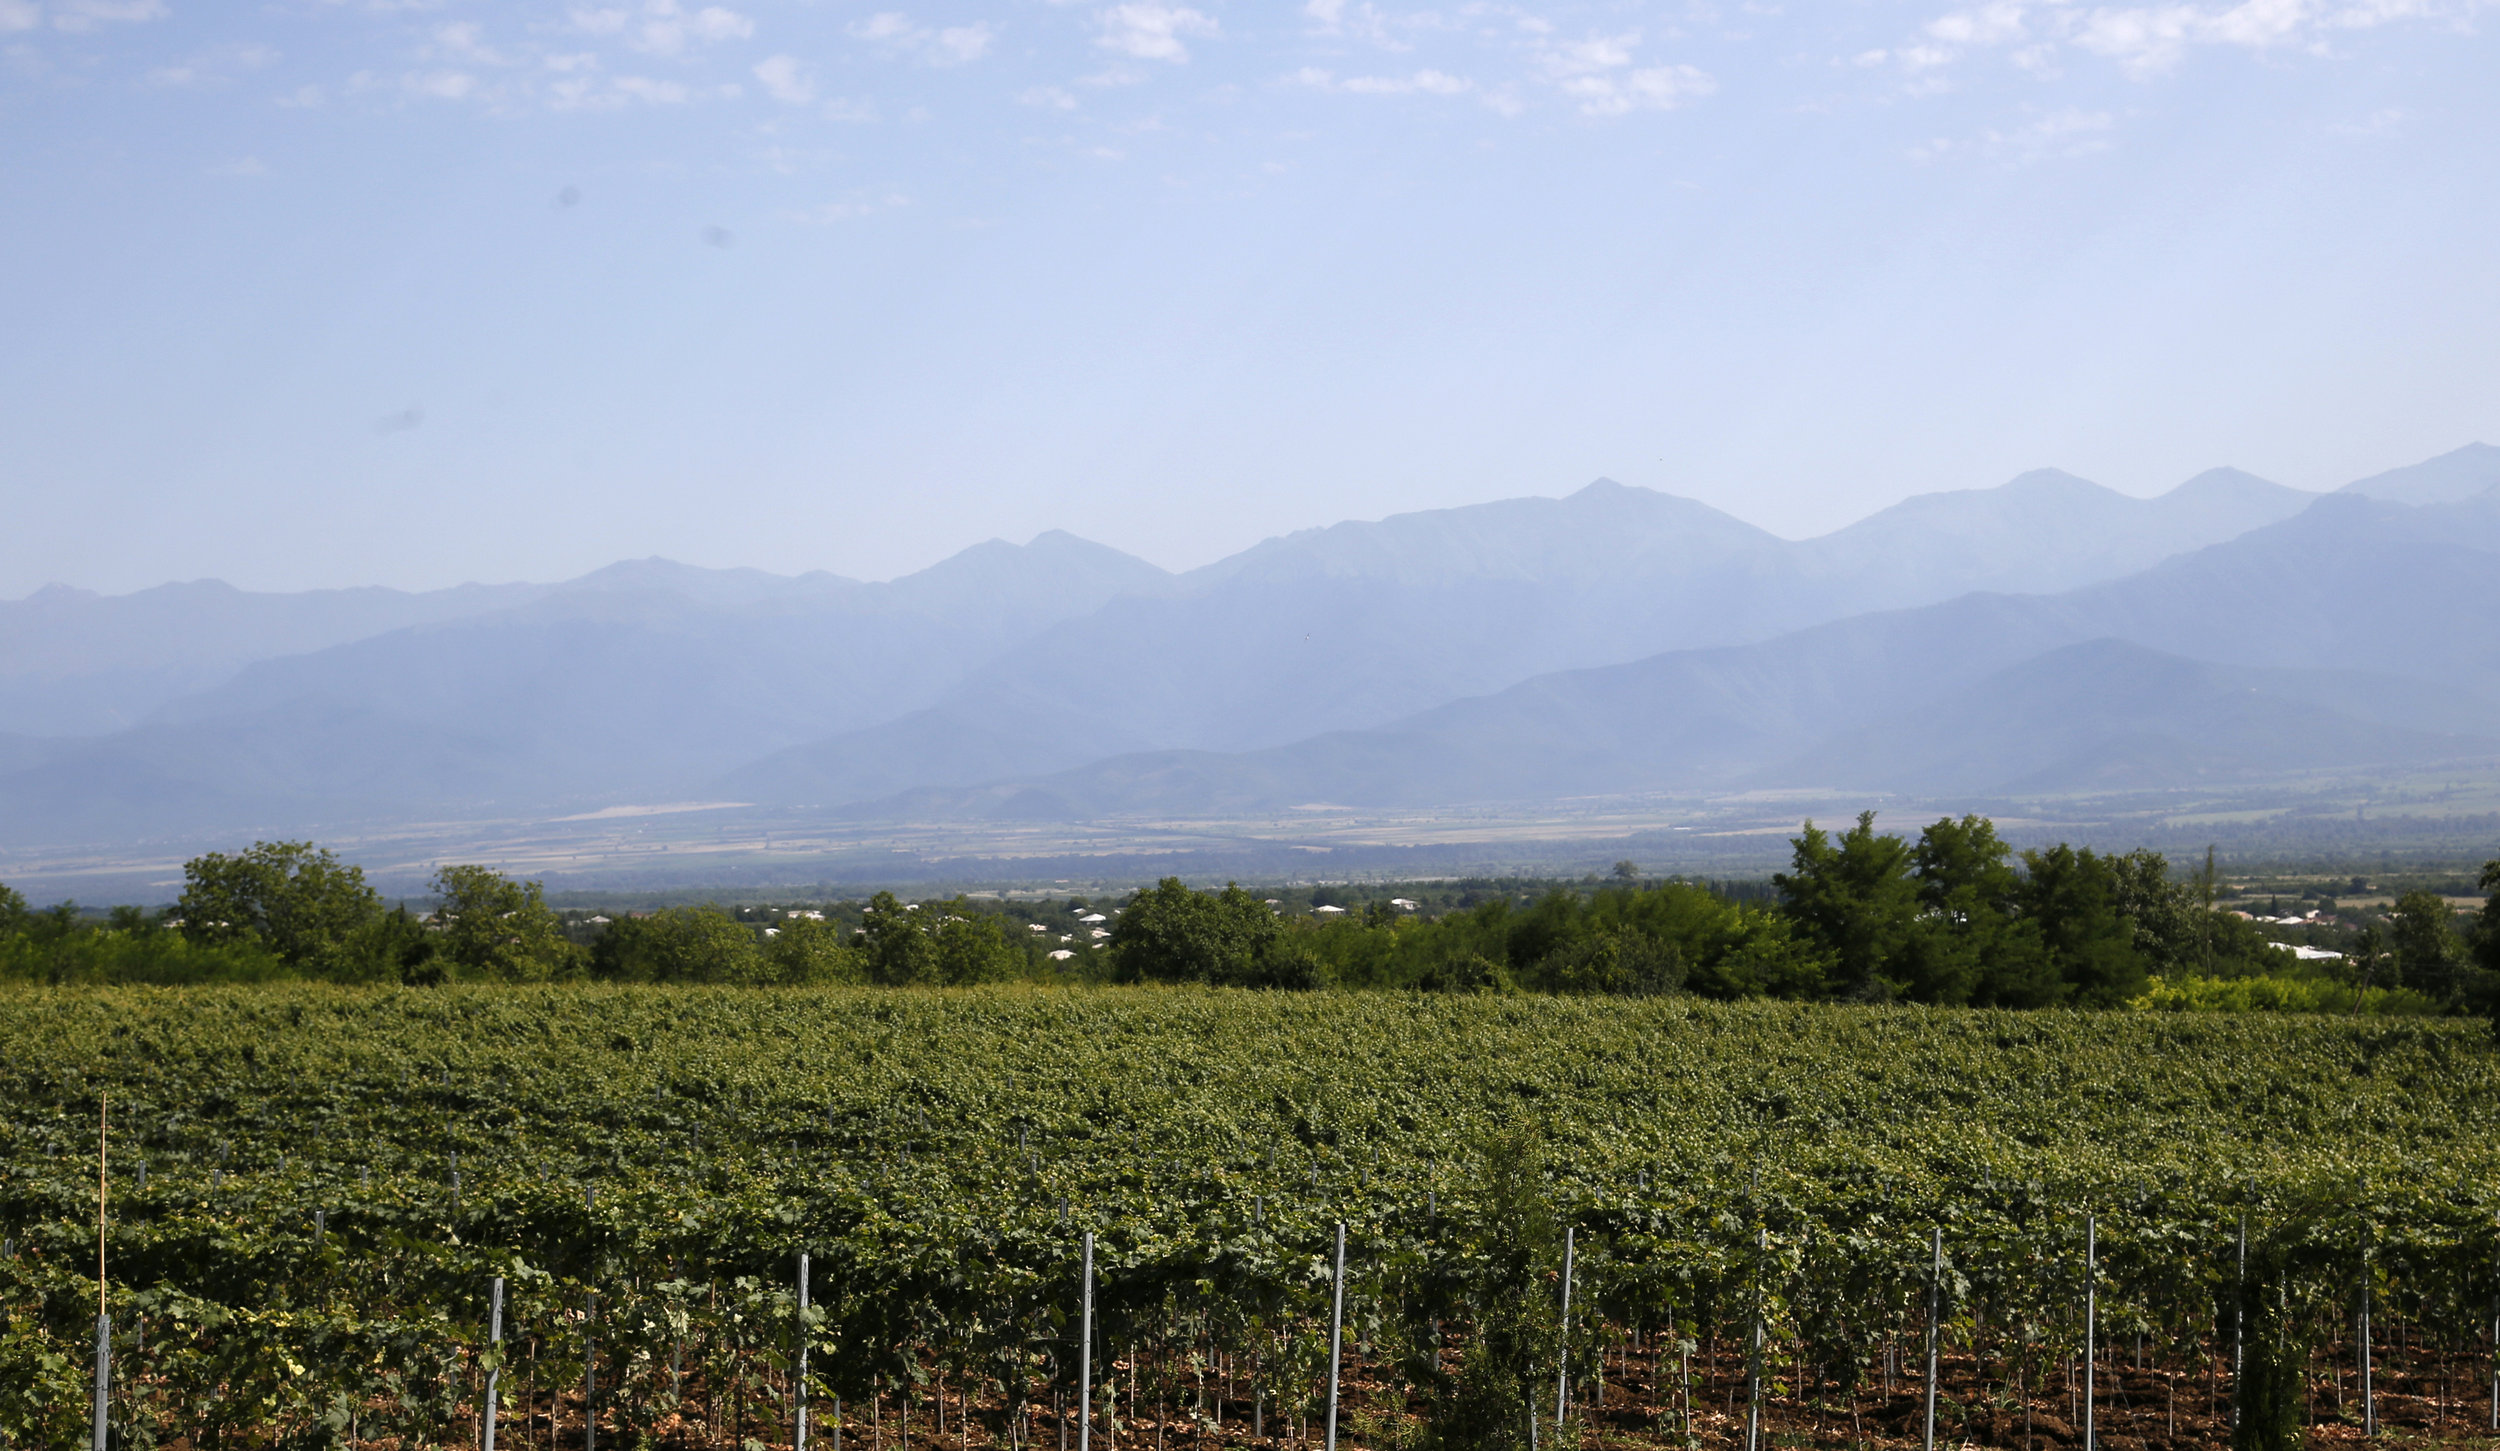 Wines similar to Kindzmarauli wine are made at this vineyard